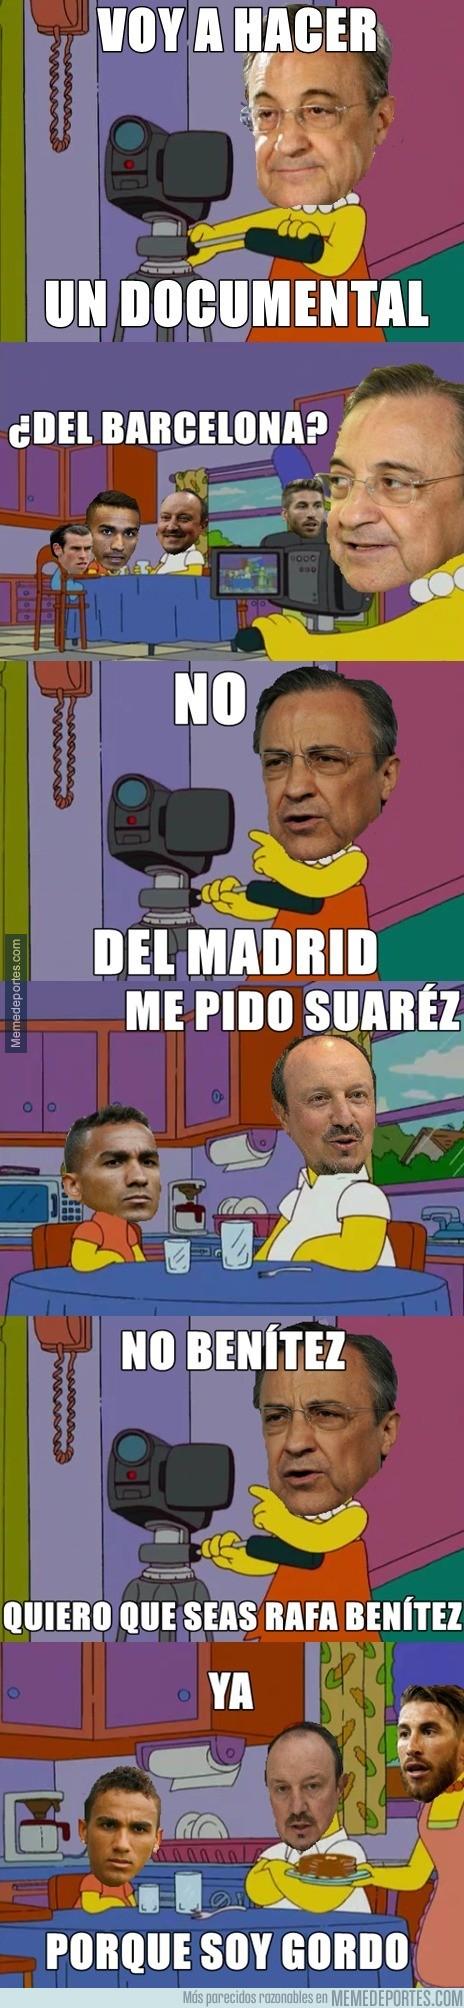 744545 - El Documental del Real Madrid